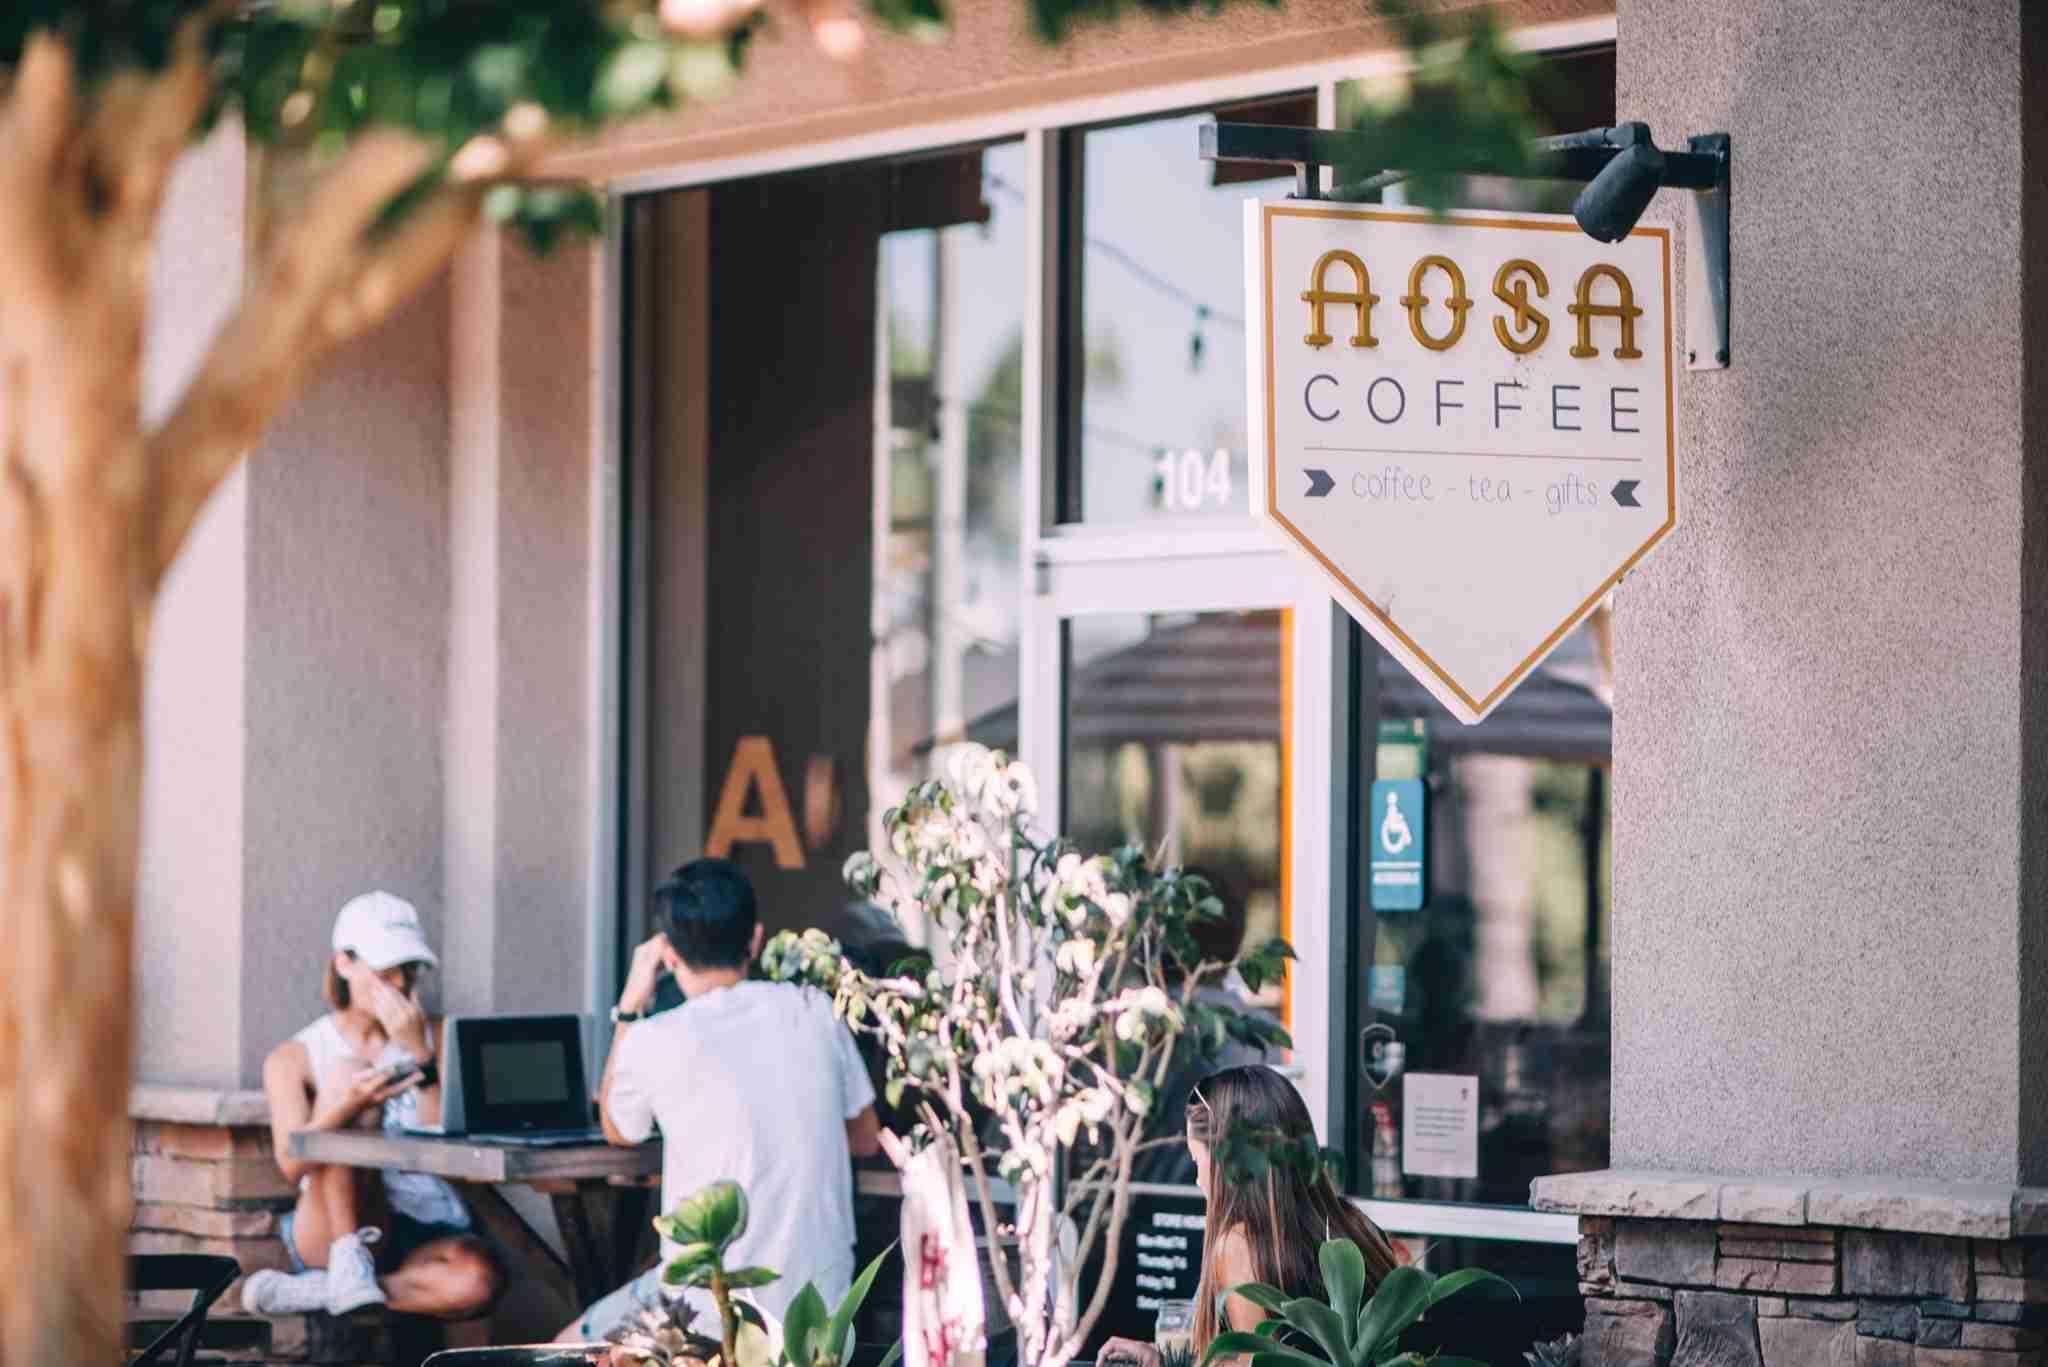 Huntington Beach coffee shops